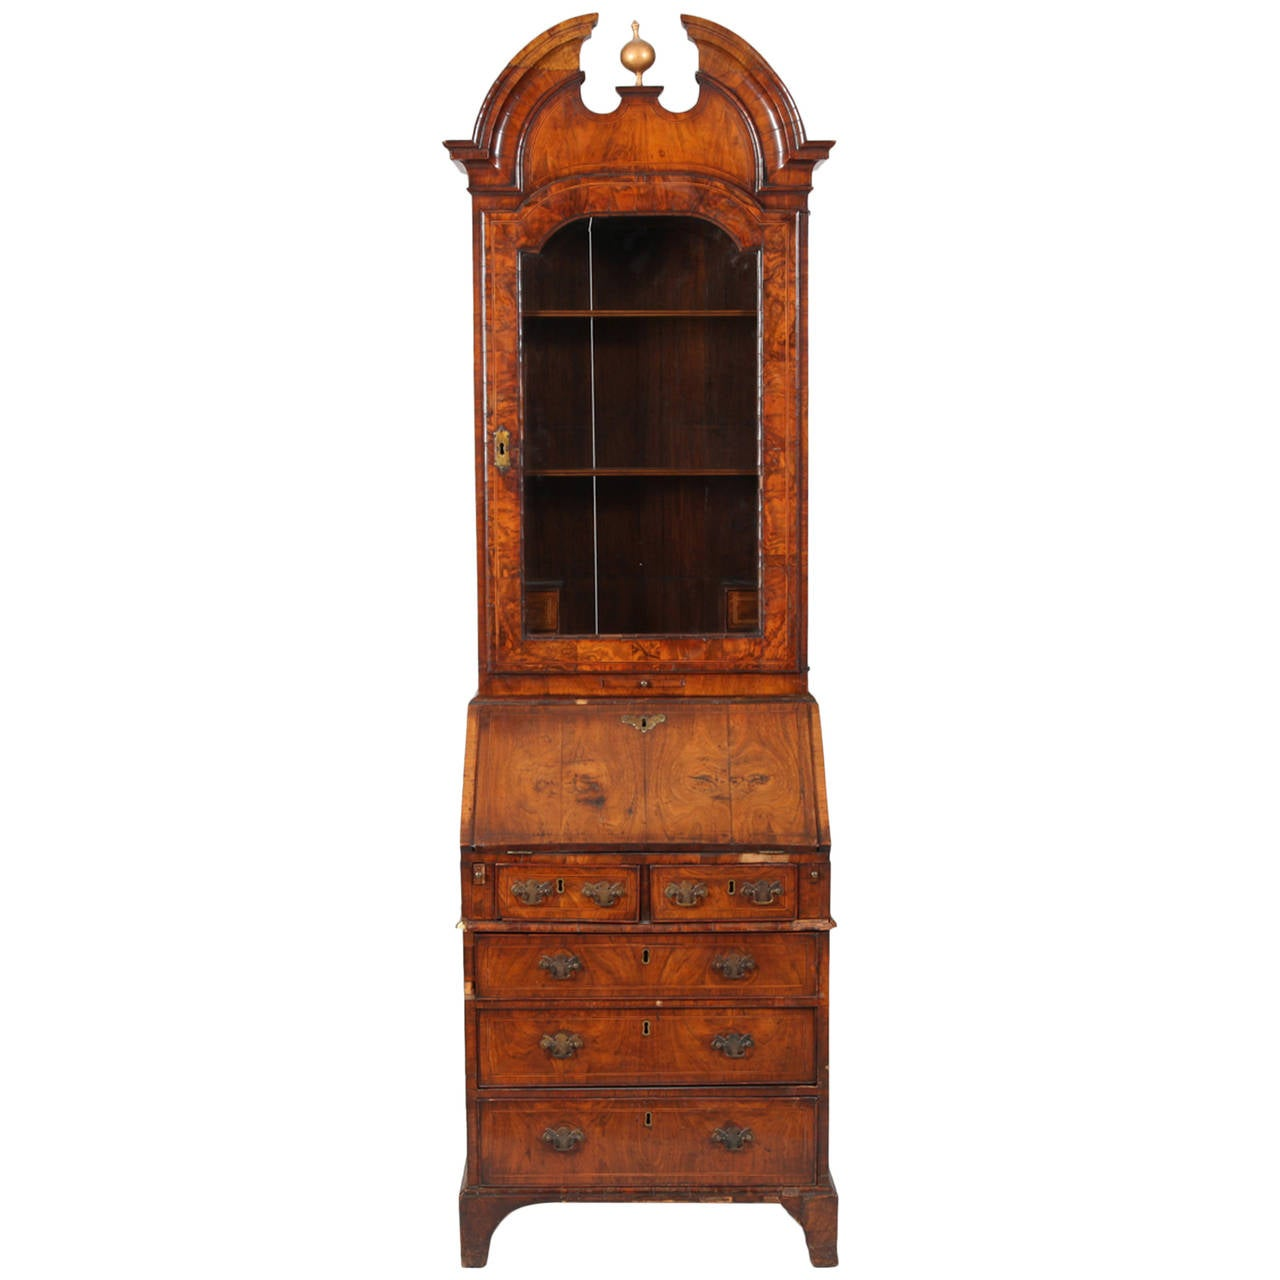 queen anne bureau bookcase in figured walnut at 1stdibs. Black Bedroom Furniture Sets. Home Design Ideas